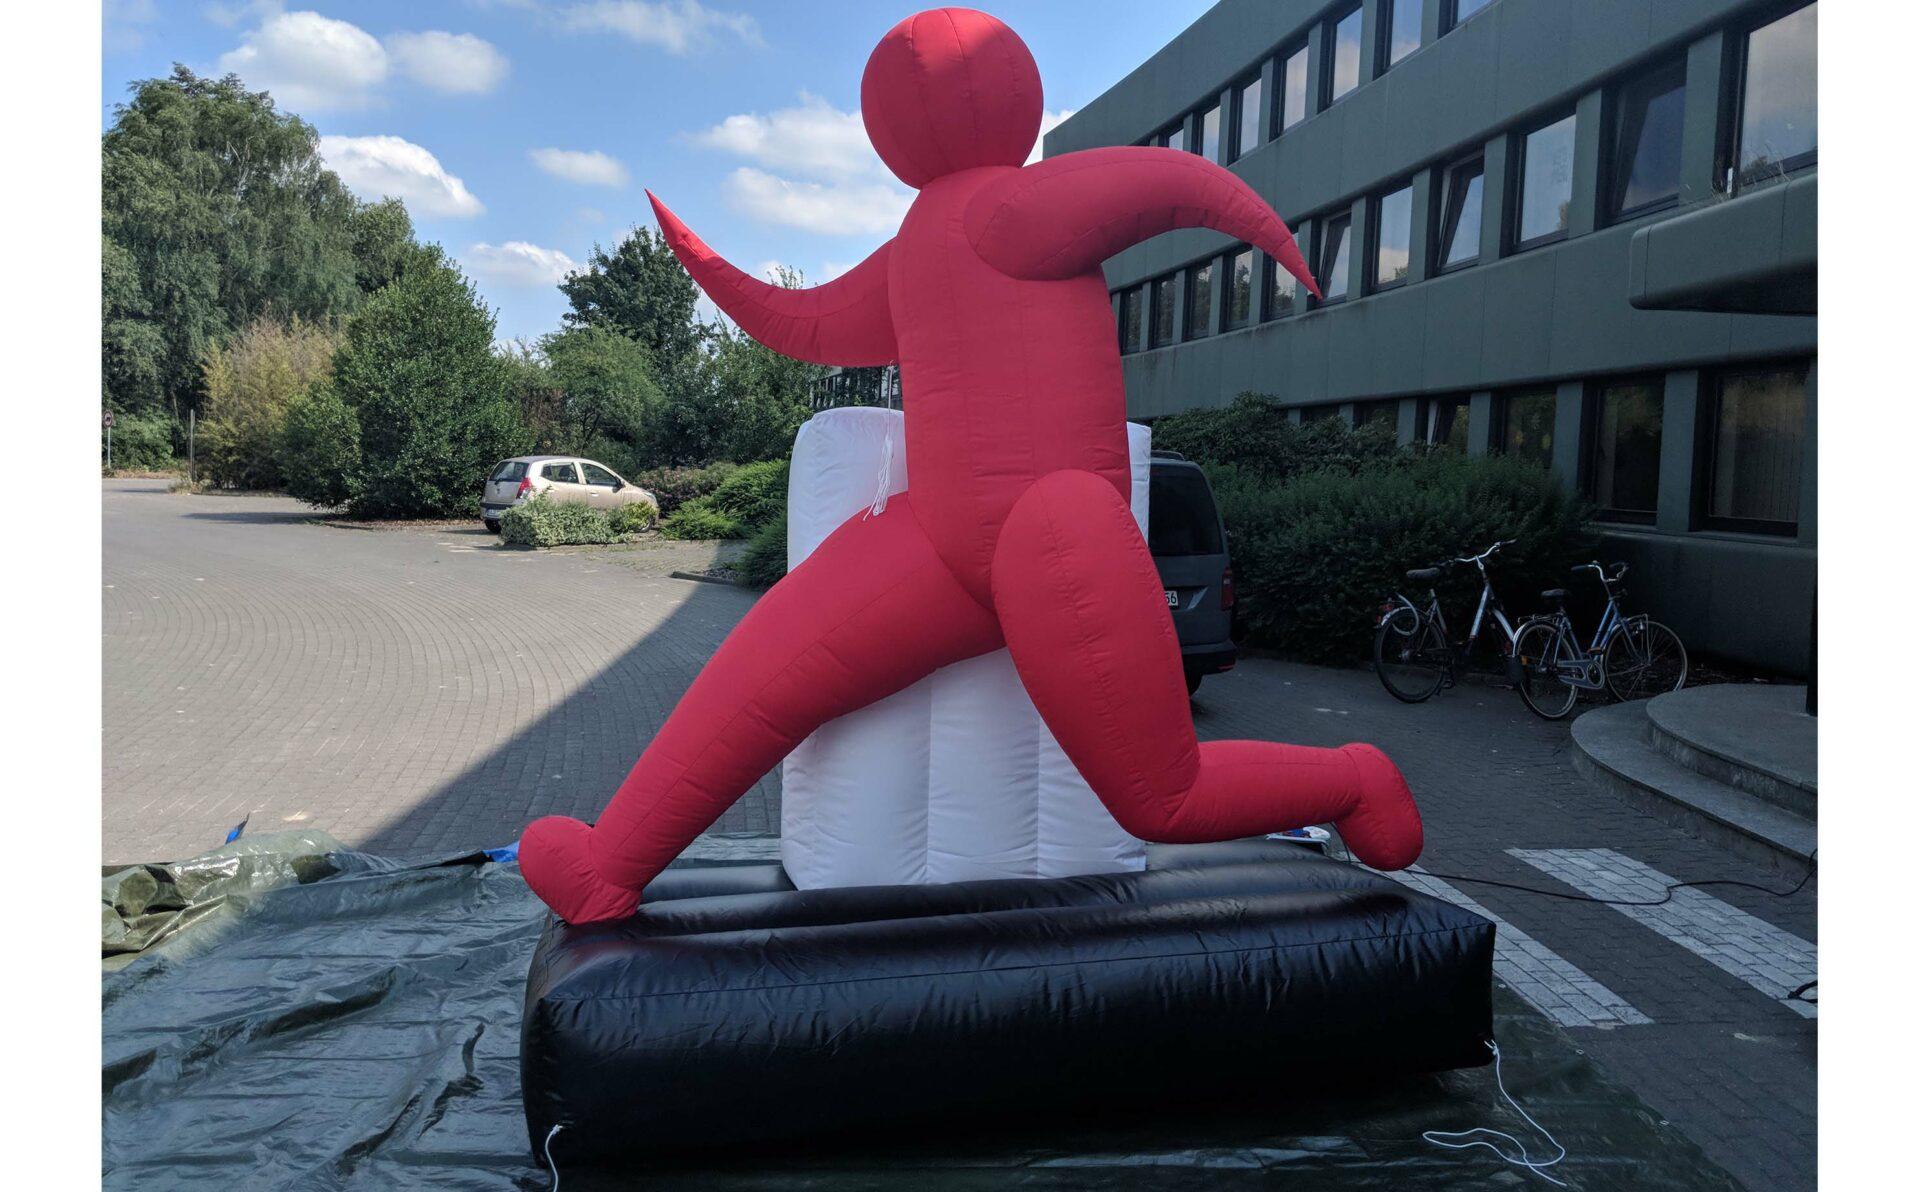 aufblasbare-Figur 3m